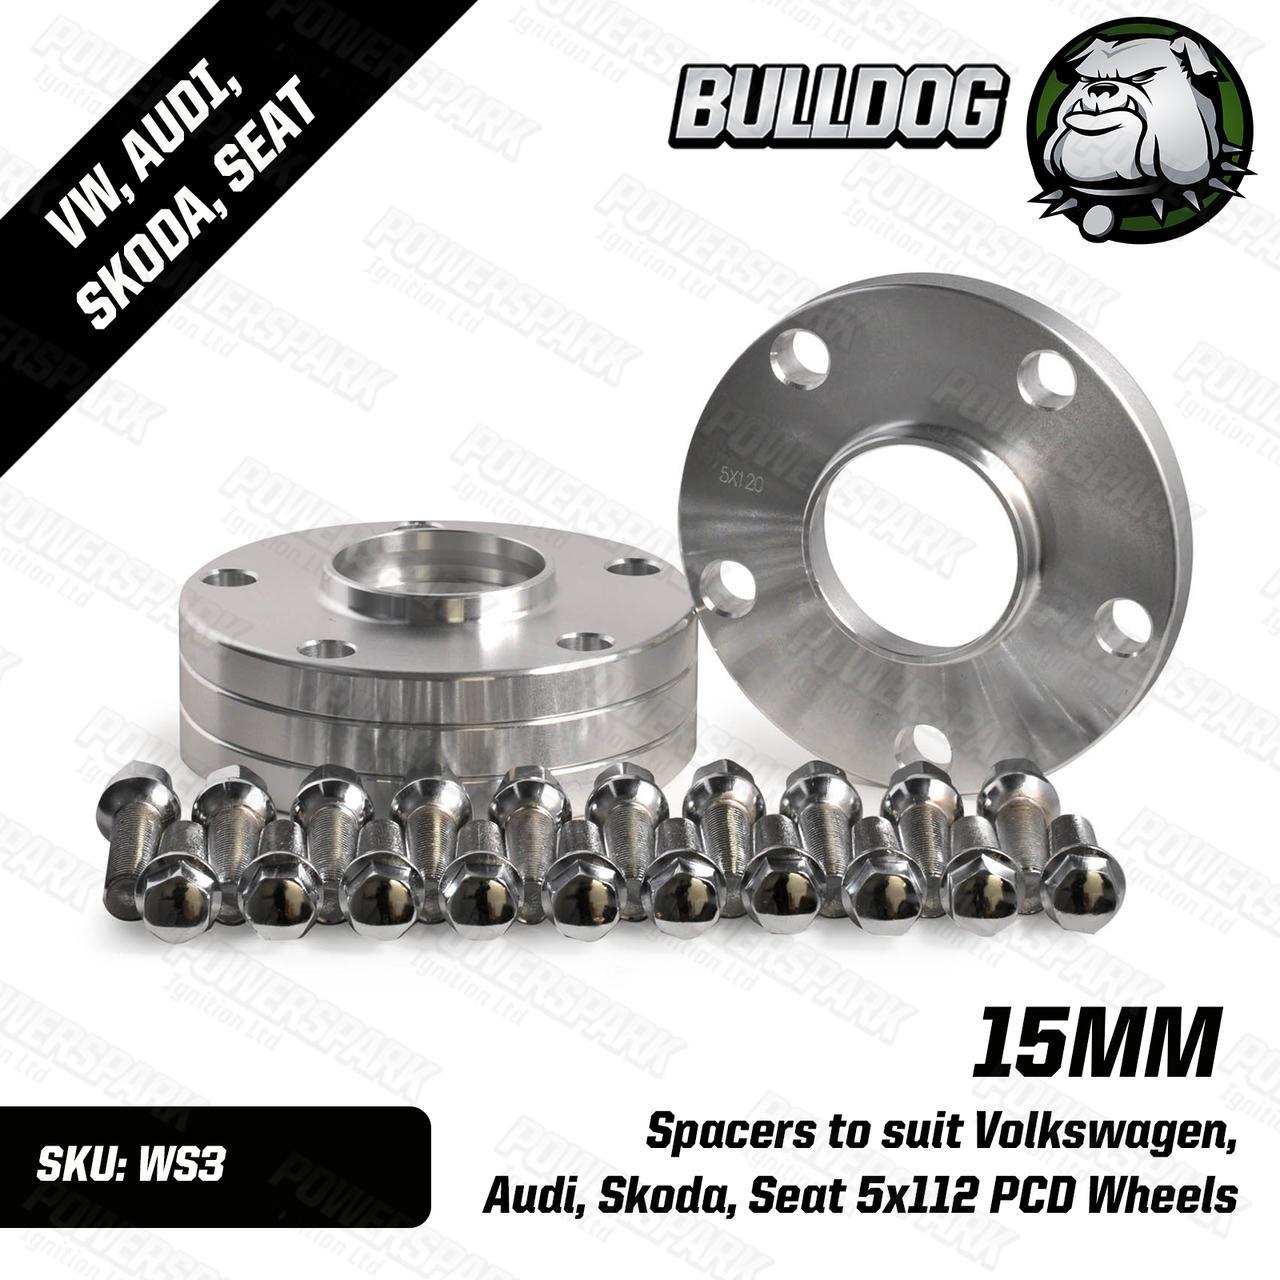 Bulldog Set of 4 Bulldog 15mm Wheel Spacers to suit Volkswagen, Audi, Skoda, Seat 5x112 PCD Wheels